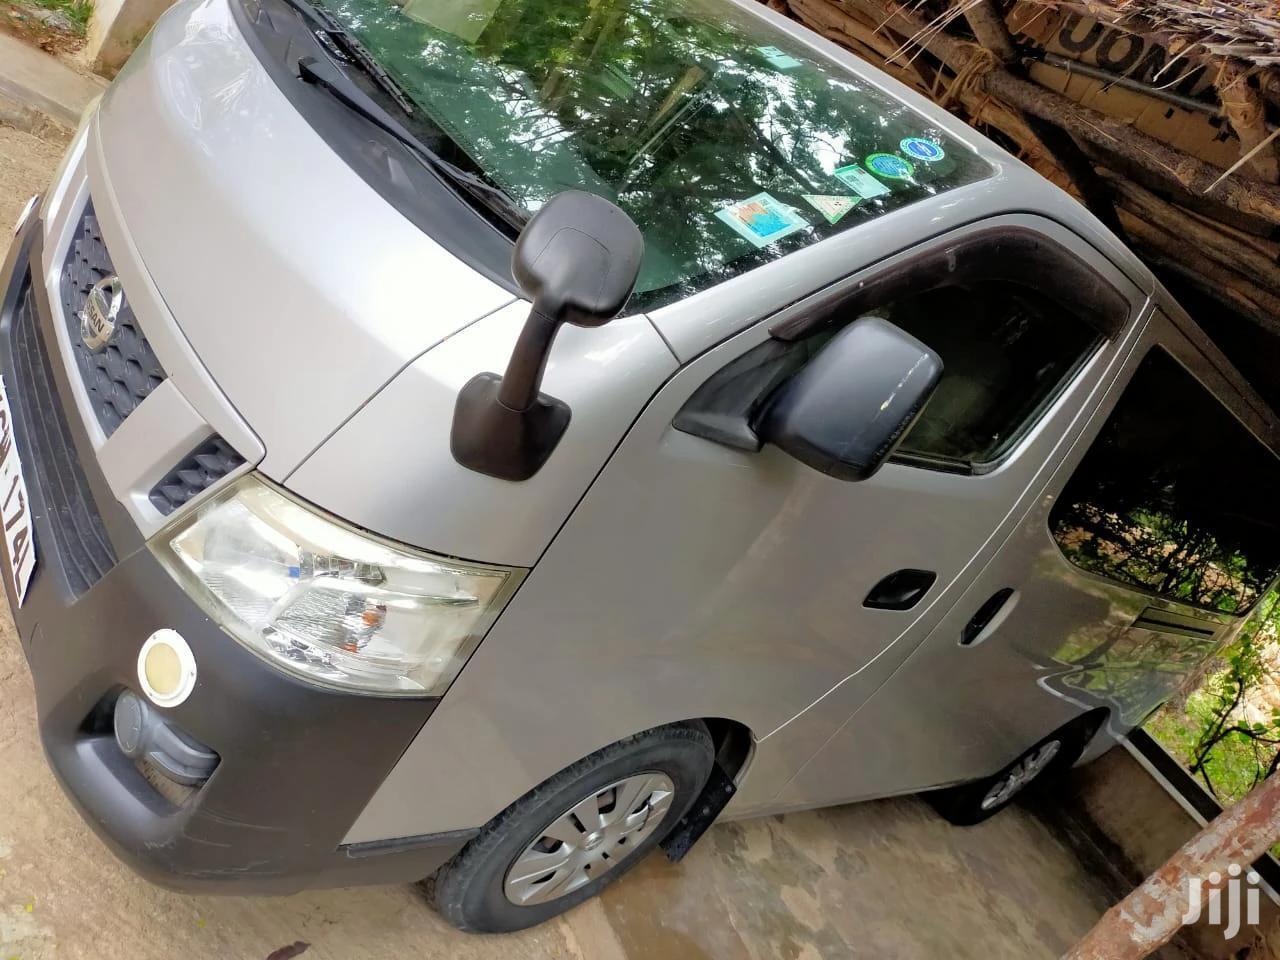 Nissan Commercial 2012 Gray | Buses & Microbuses for sale in Majengo, Mombasa, Kenya